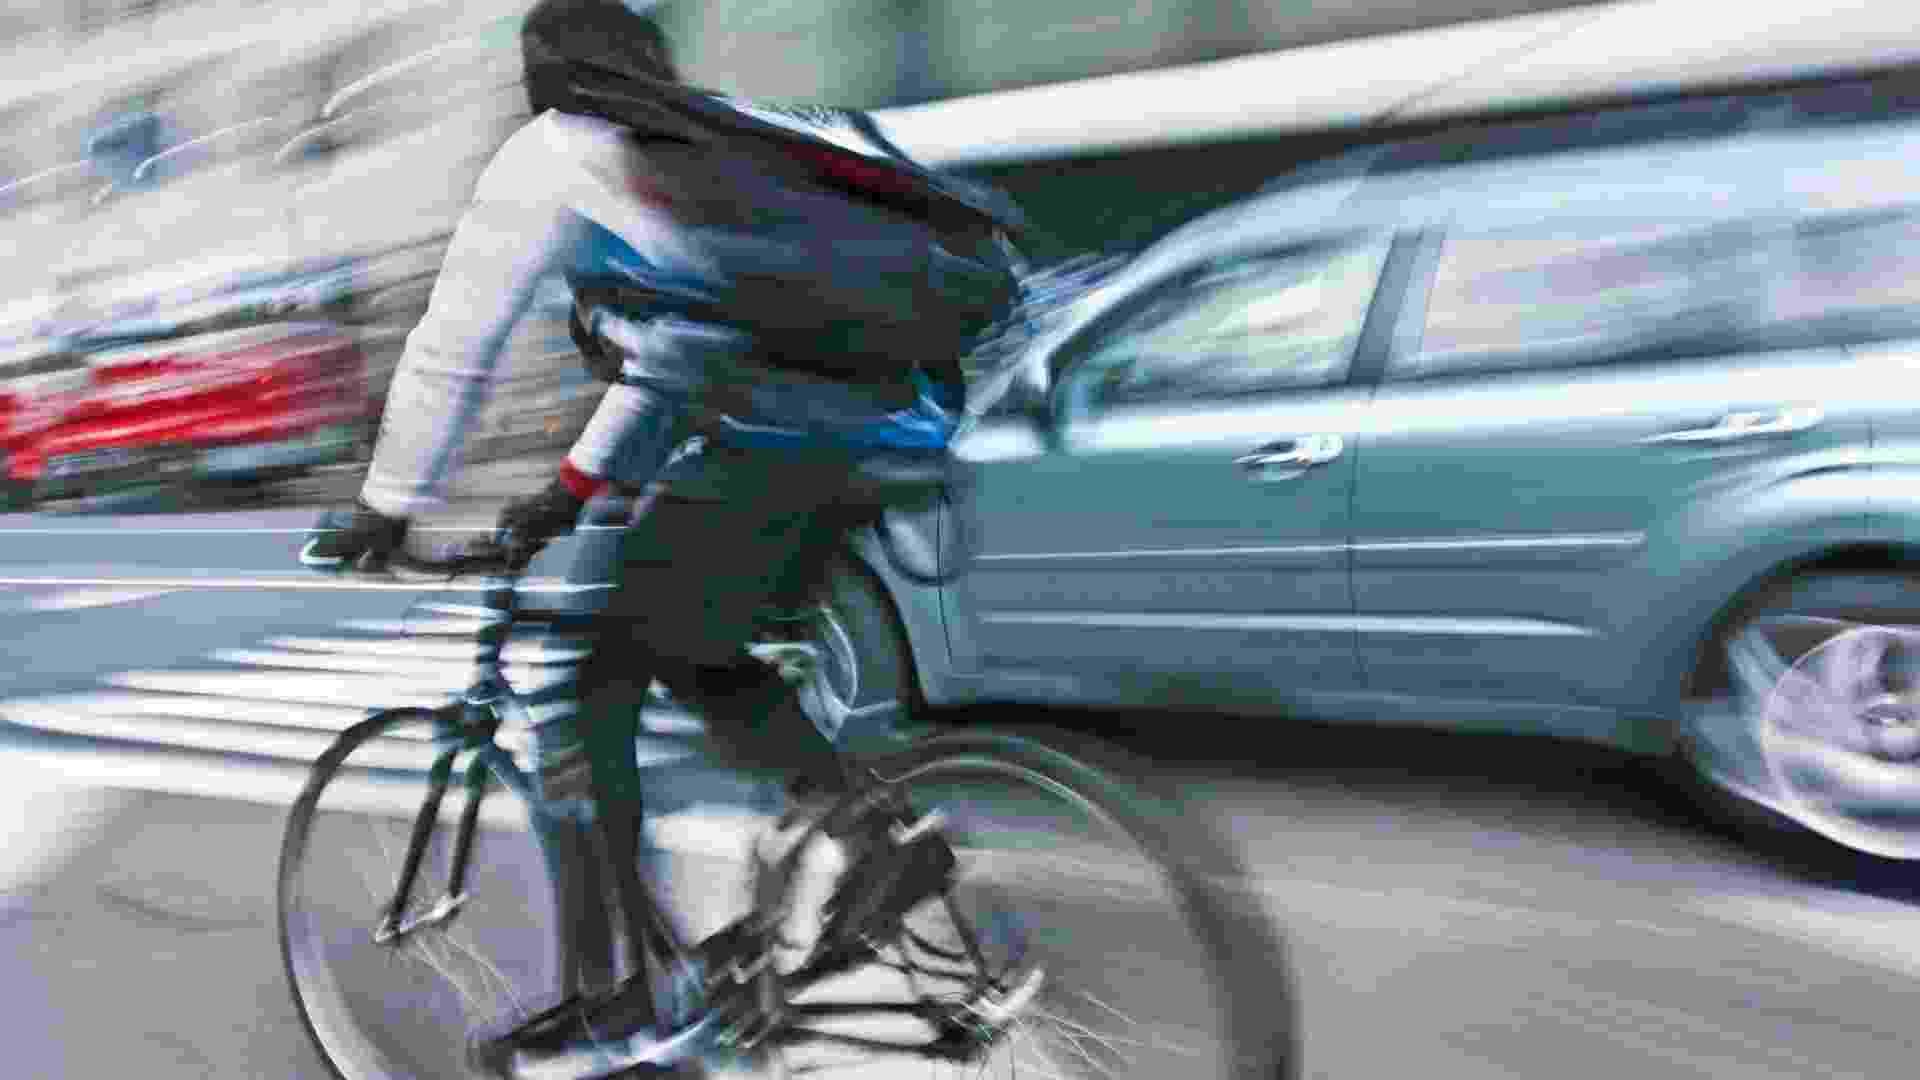 Ciclista, bicicleta na cidade - Thinkstock